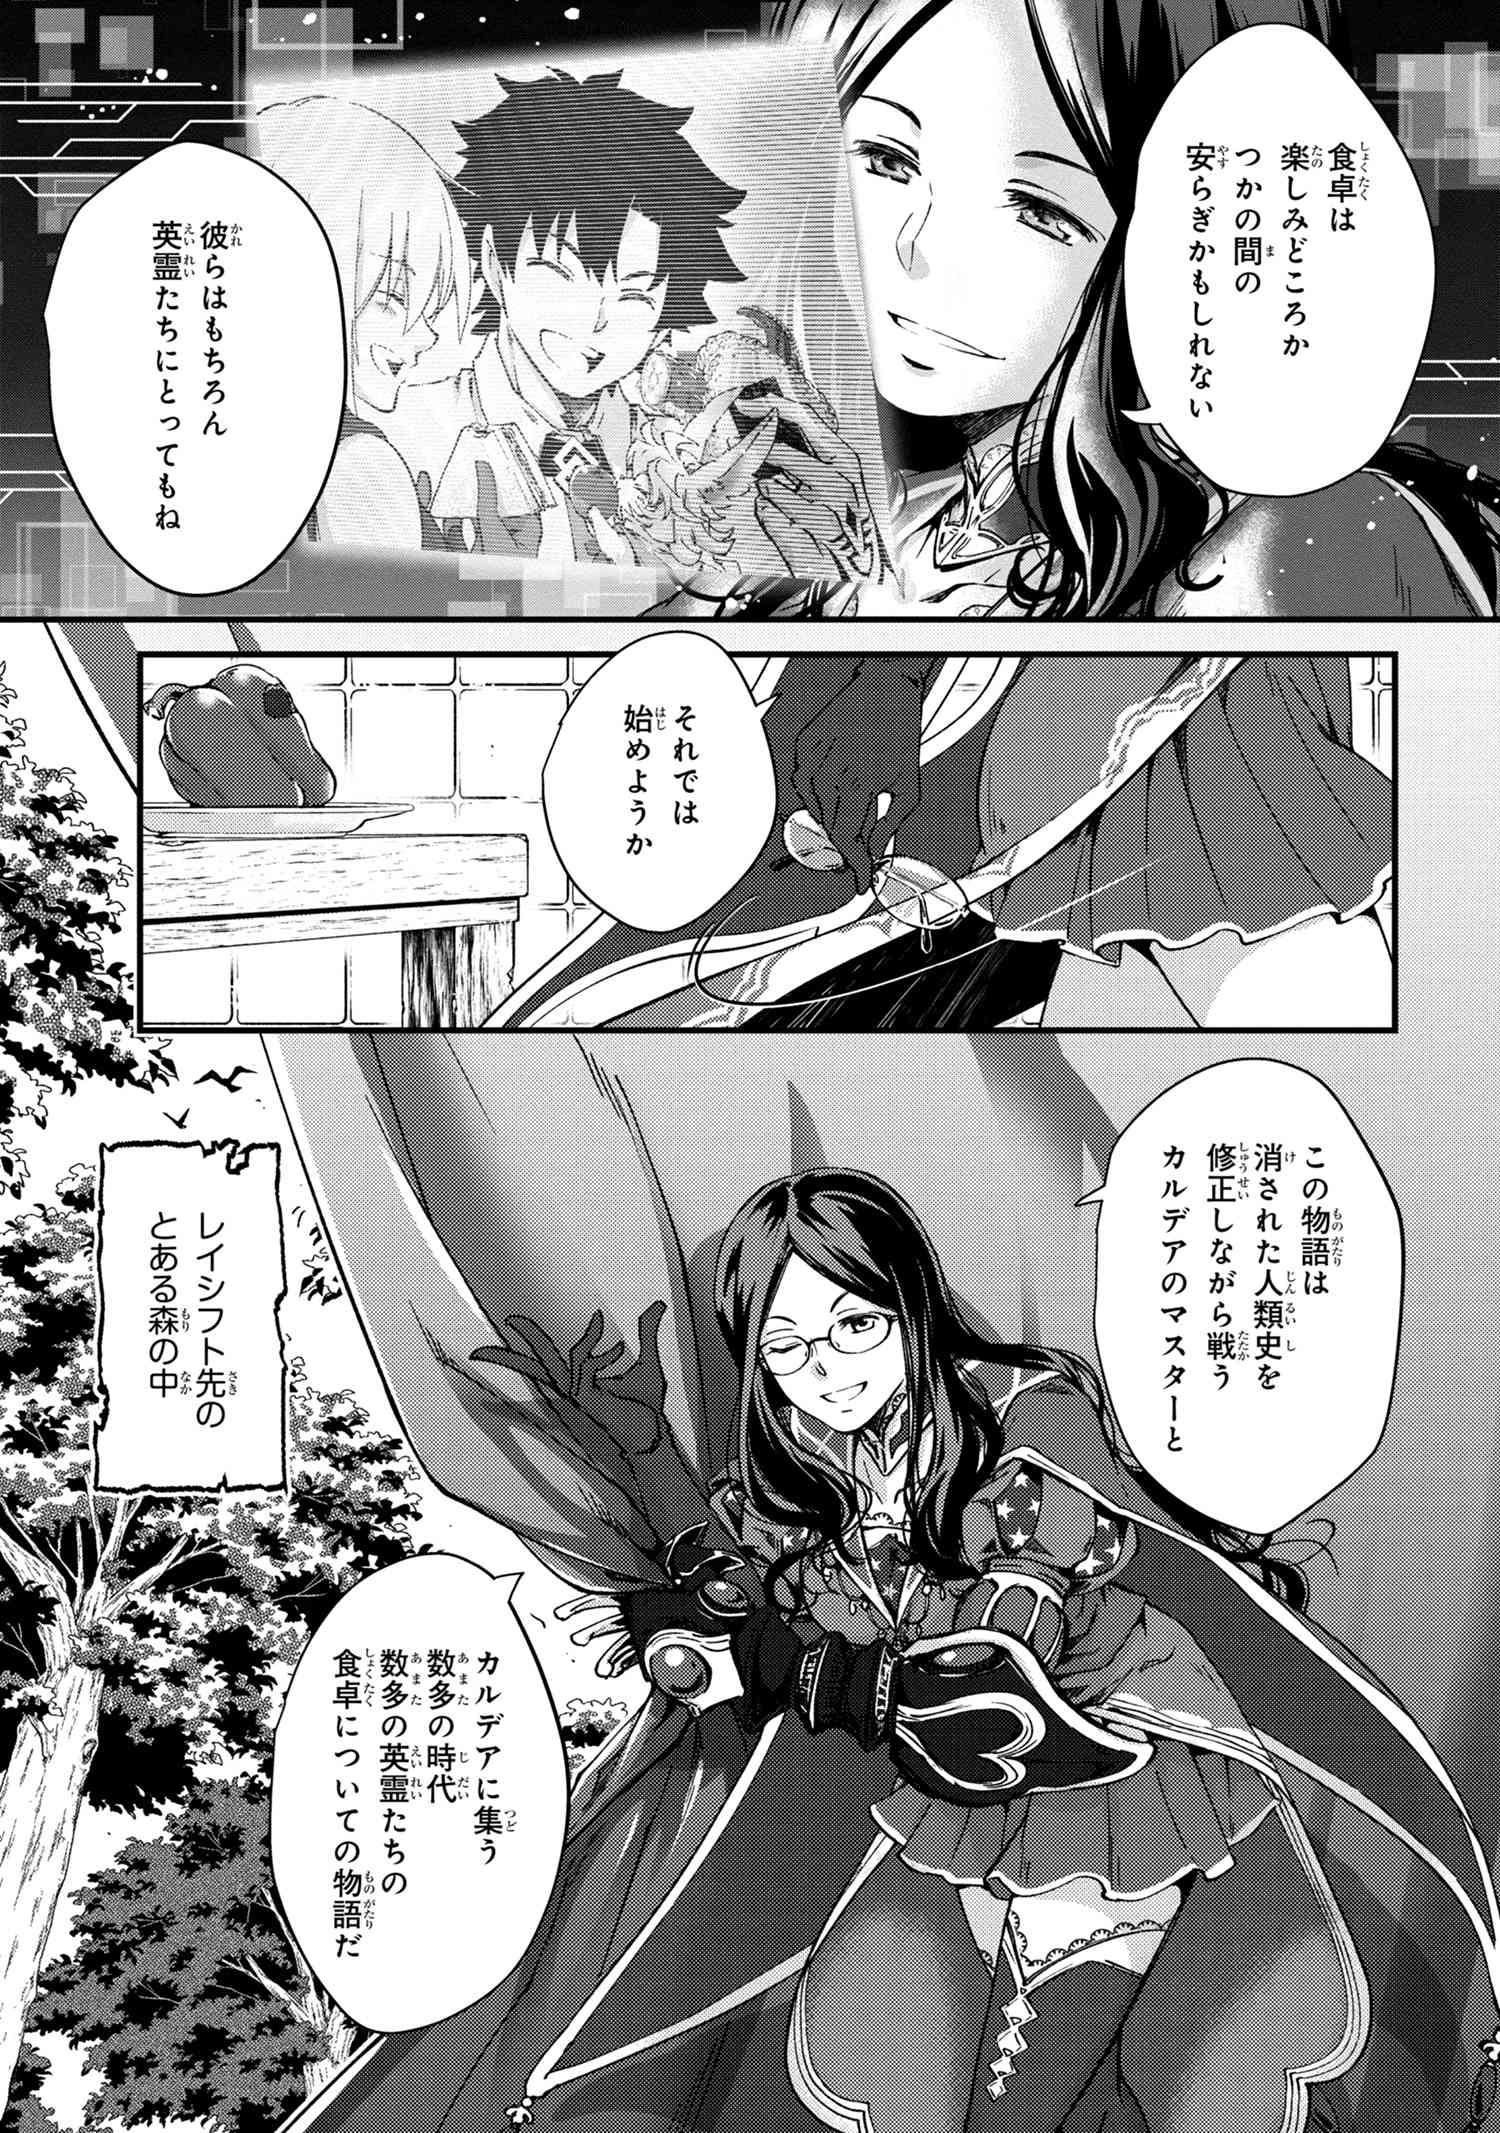 Fate/Grand Order 英霊食聞録」第一話「英国式カレー」 TYPE-MOON ...